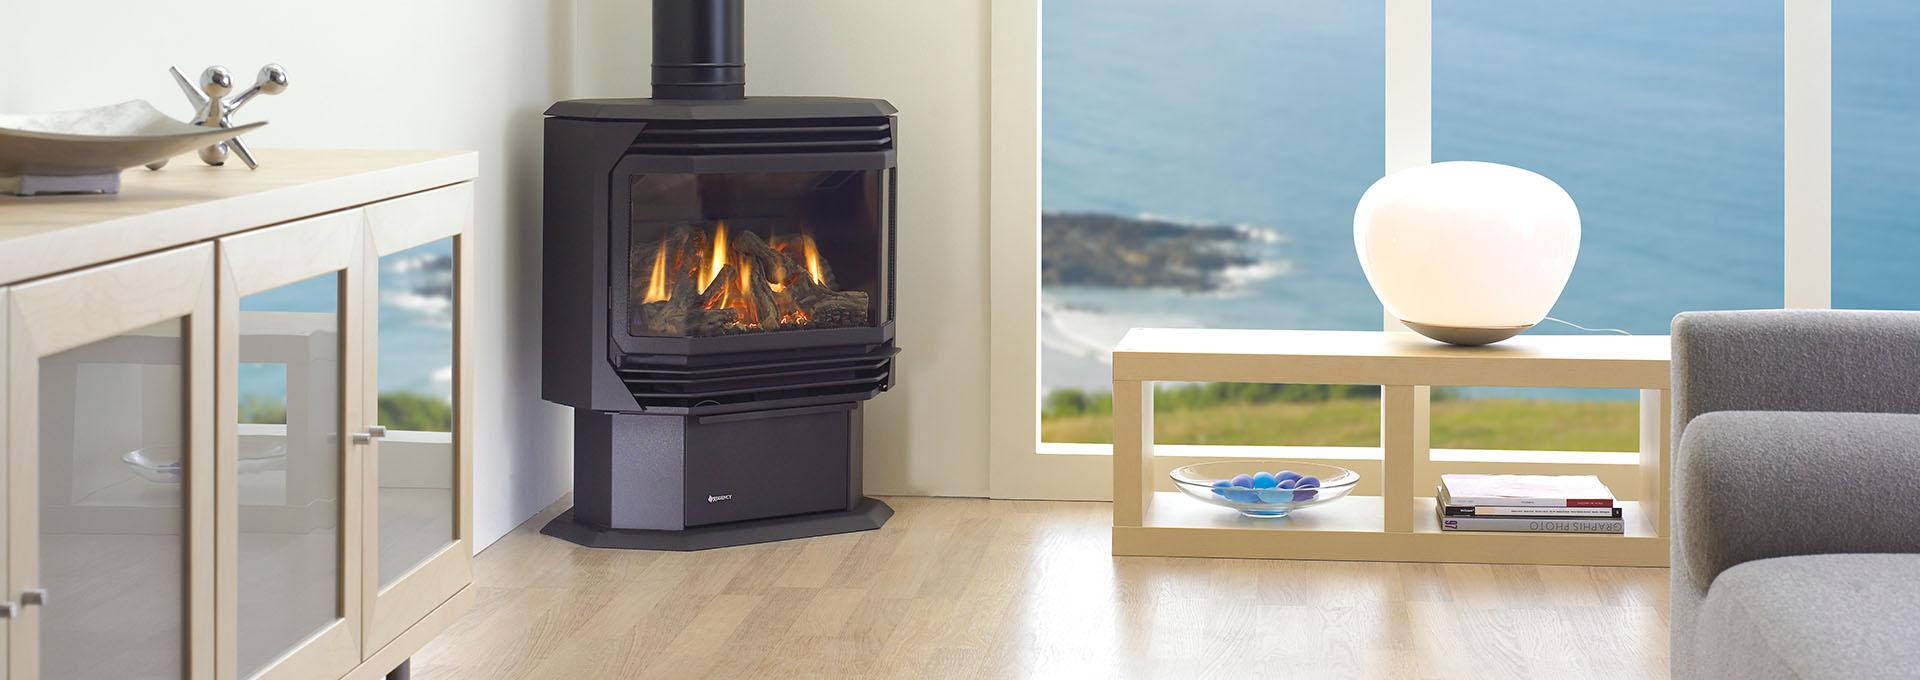 regency ultimate u2122 u38 gas stove toronto best price